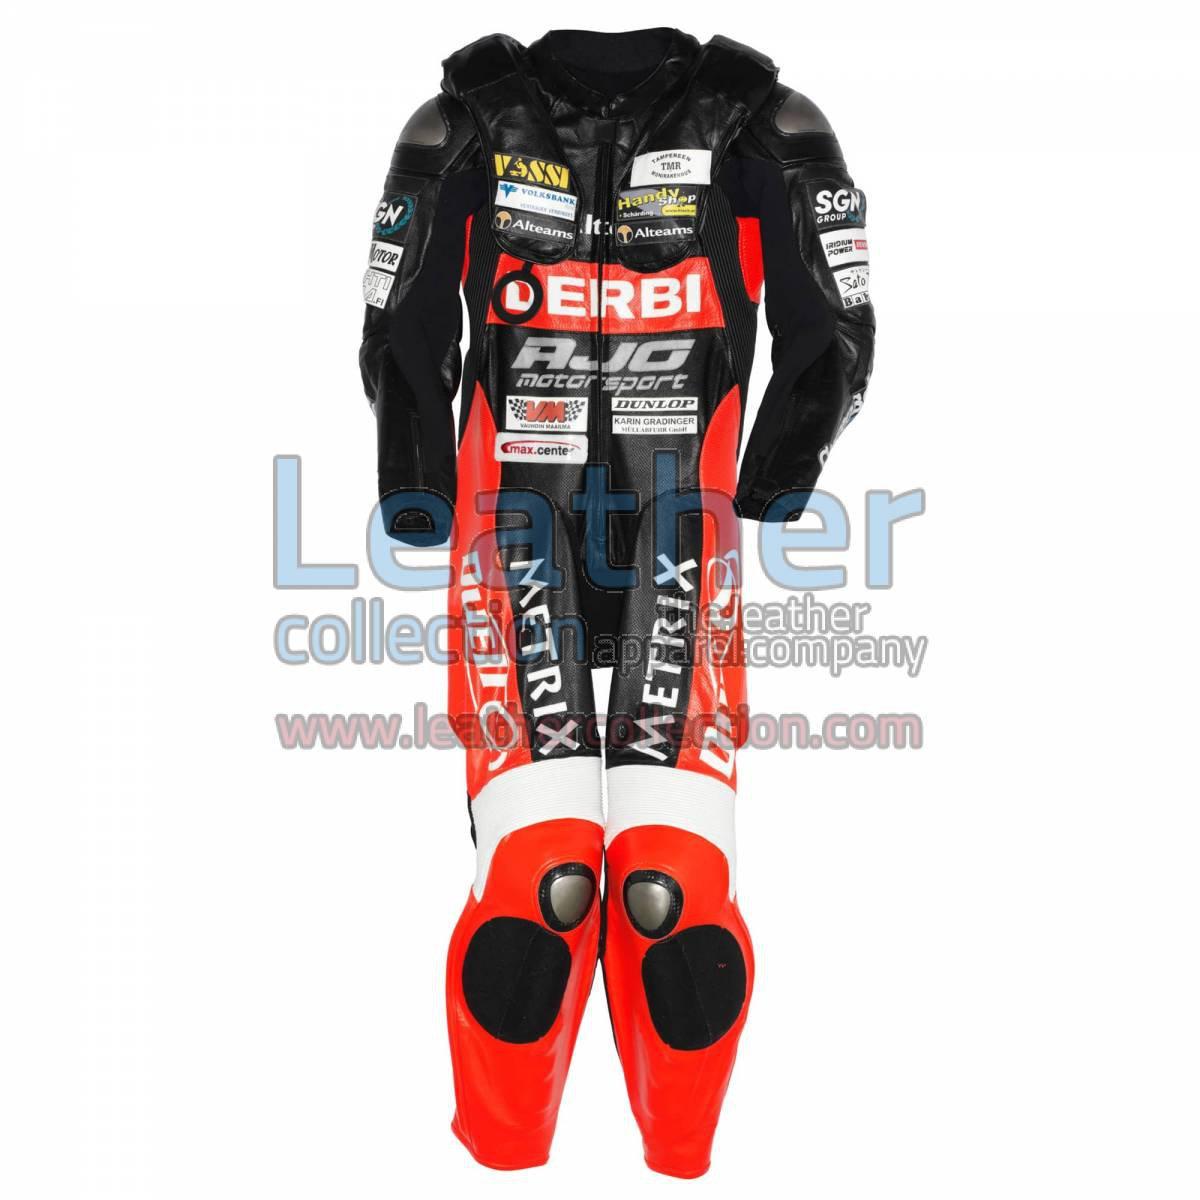 Michi Ranseder Debri GP 2007 Motorbike Suit